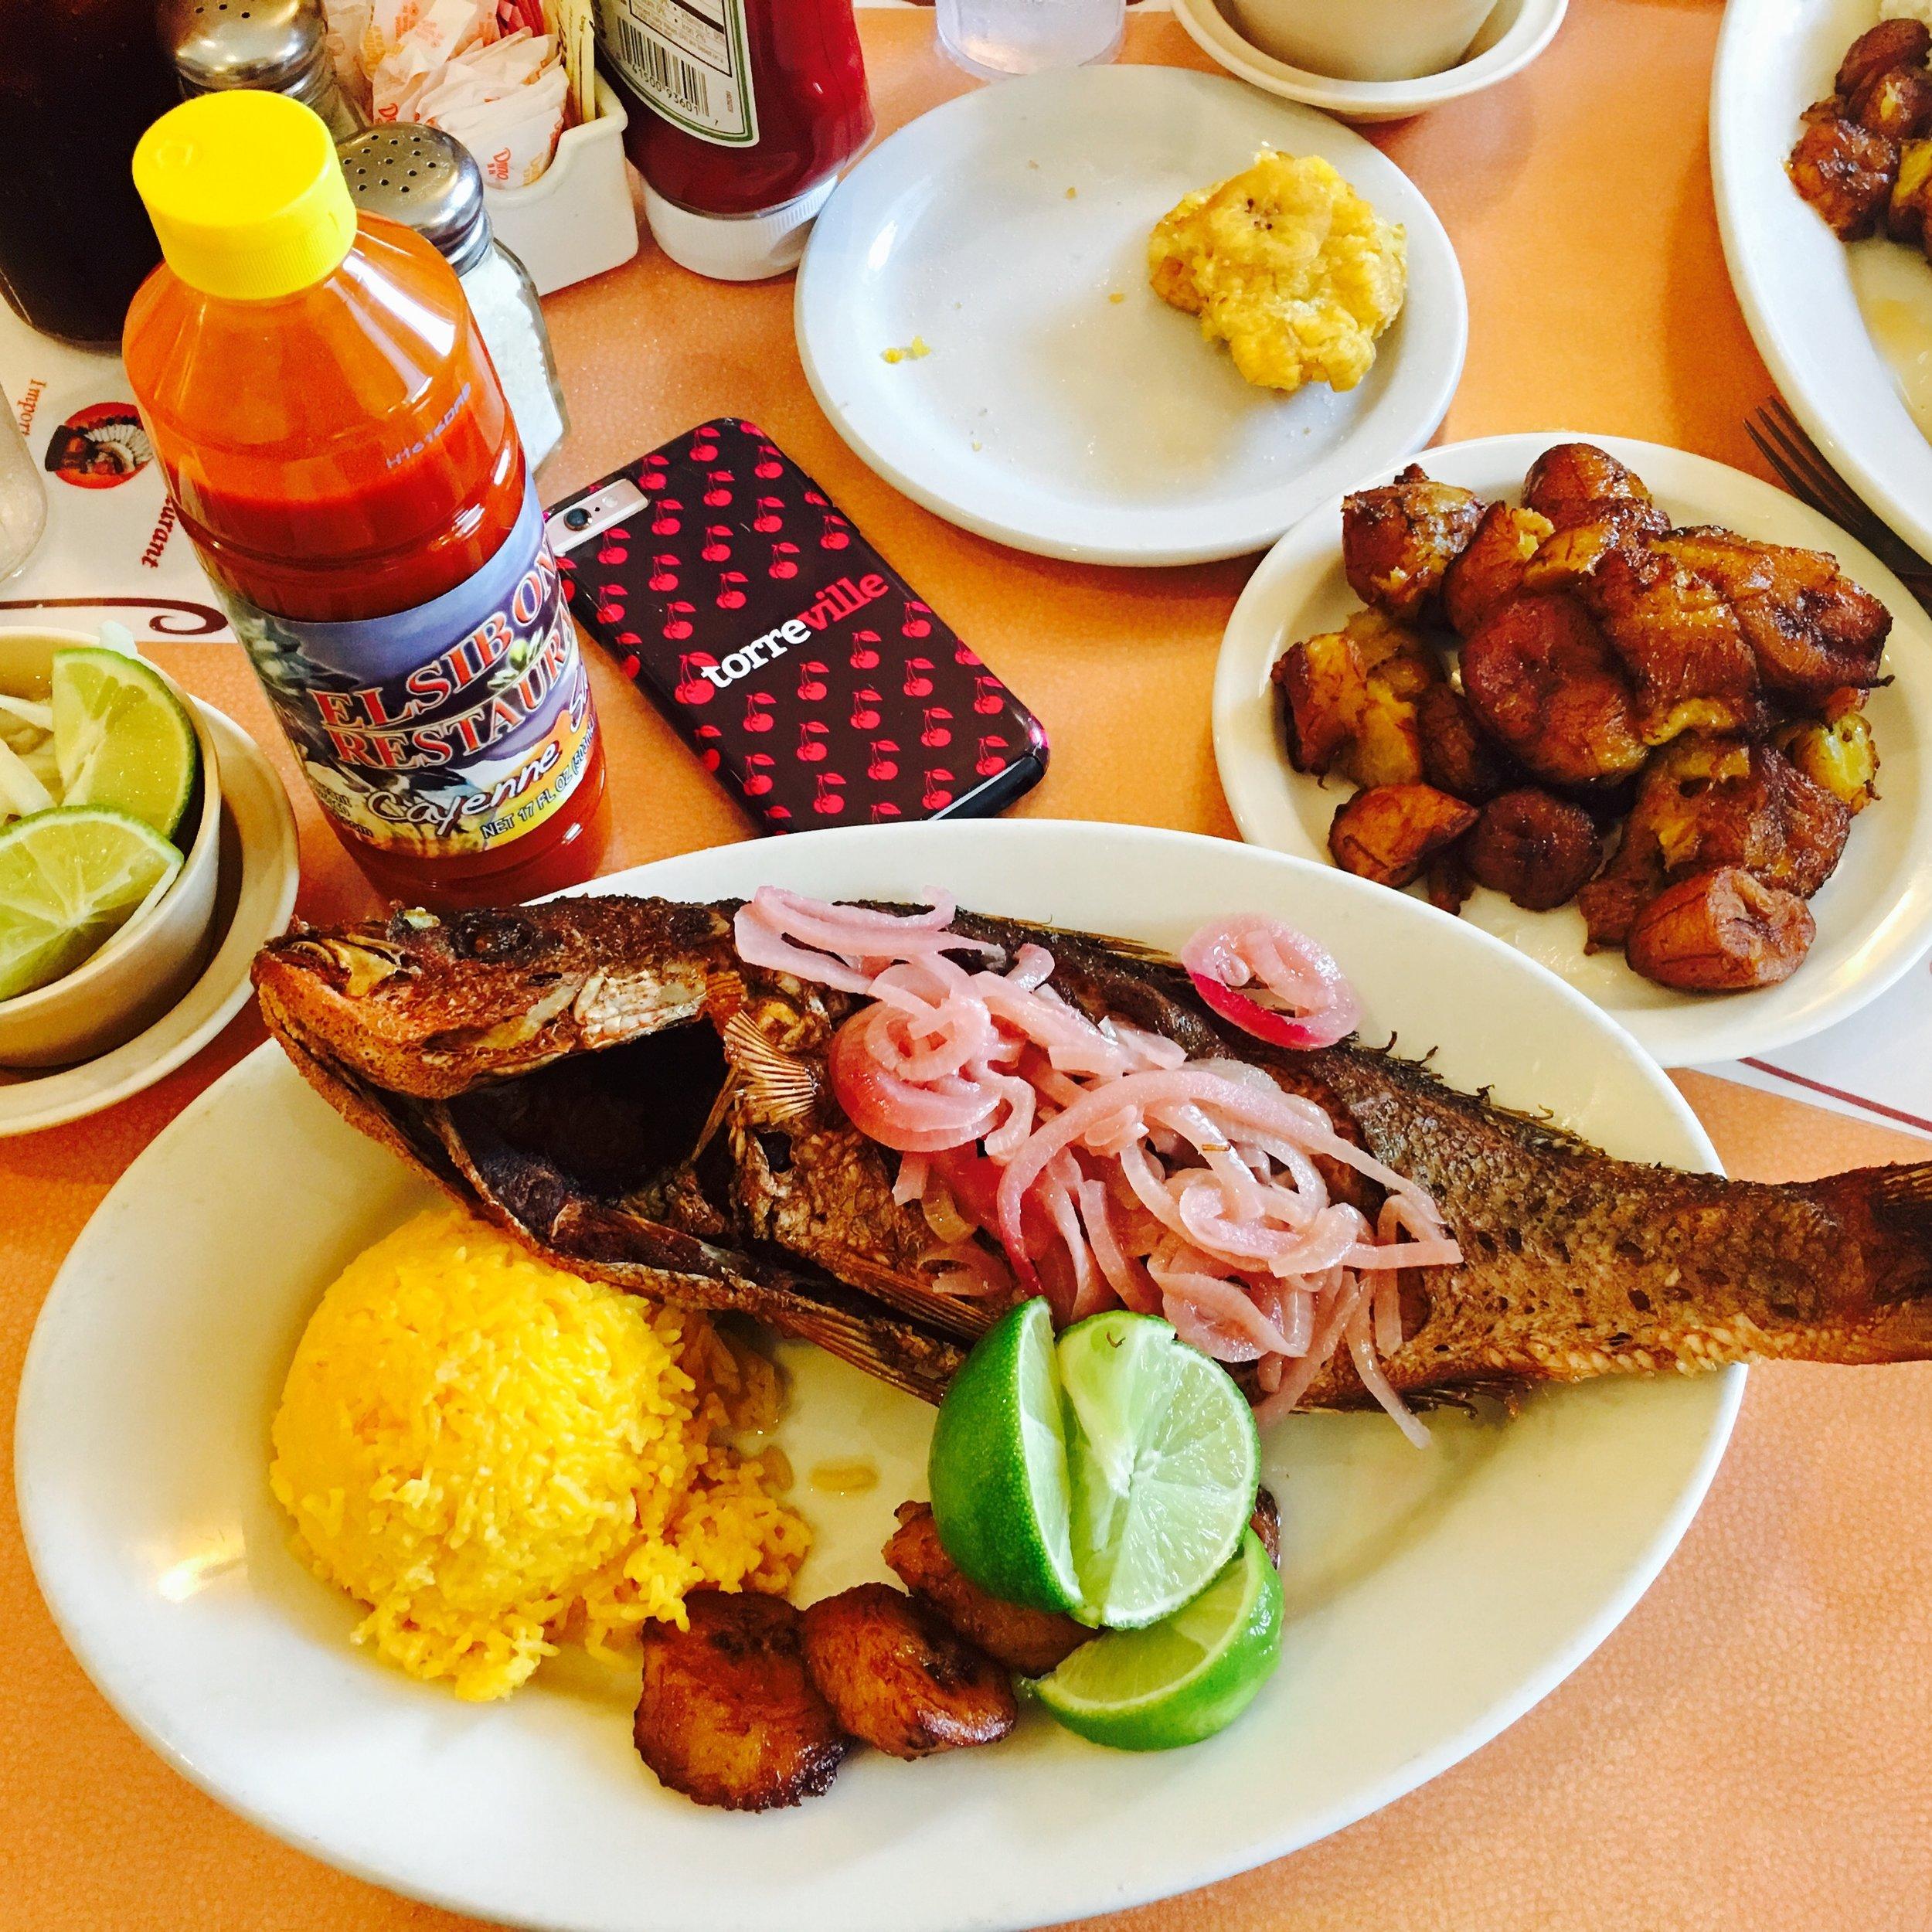 meal - cuban food key west el siboney restaurant